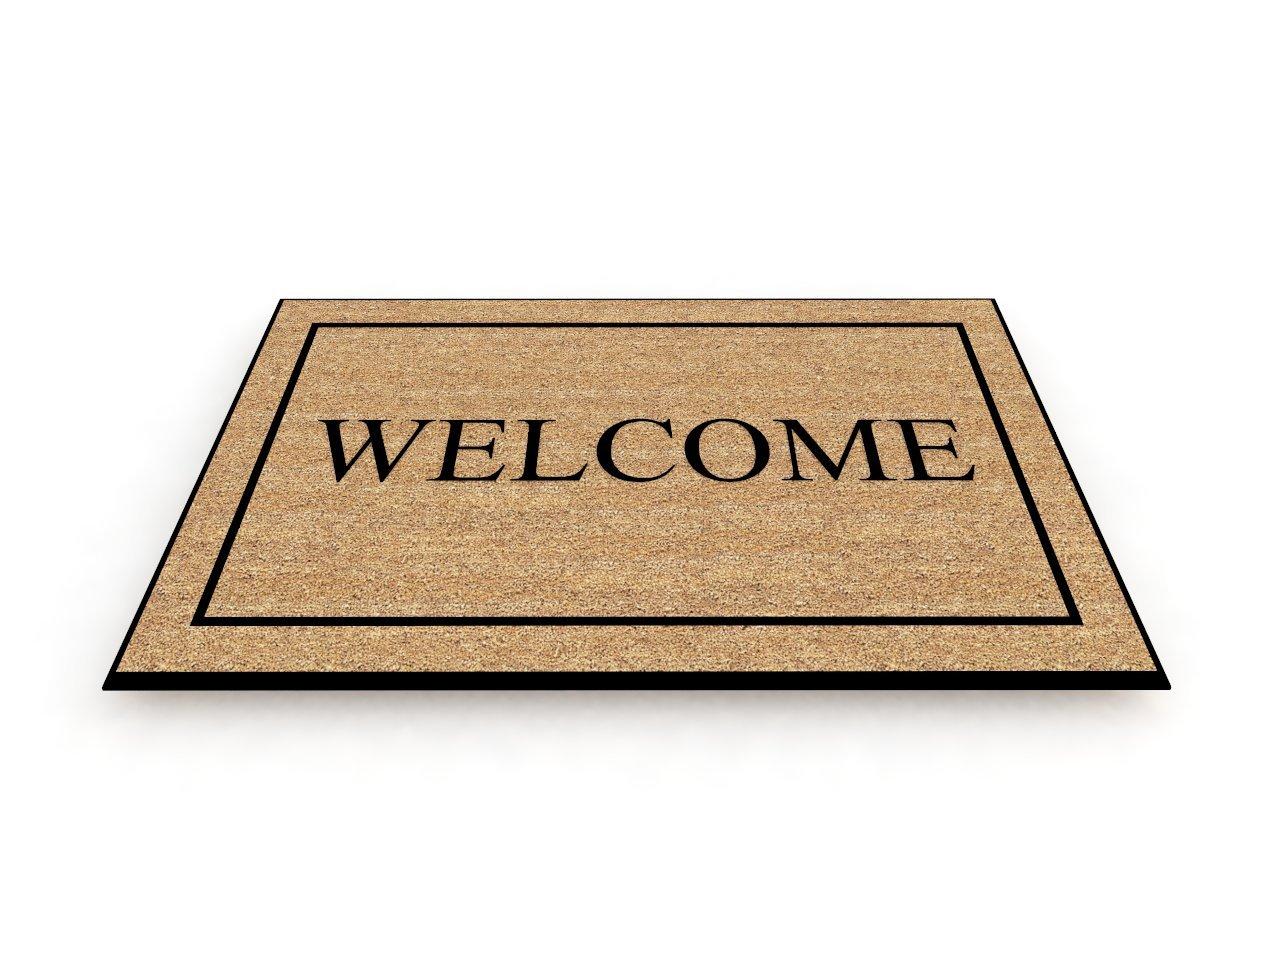 a692d65c6 Asda DoormatForest Animals Runner Doormat Set Home Garden George #952